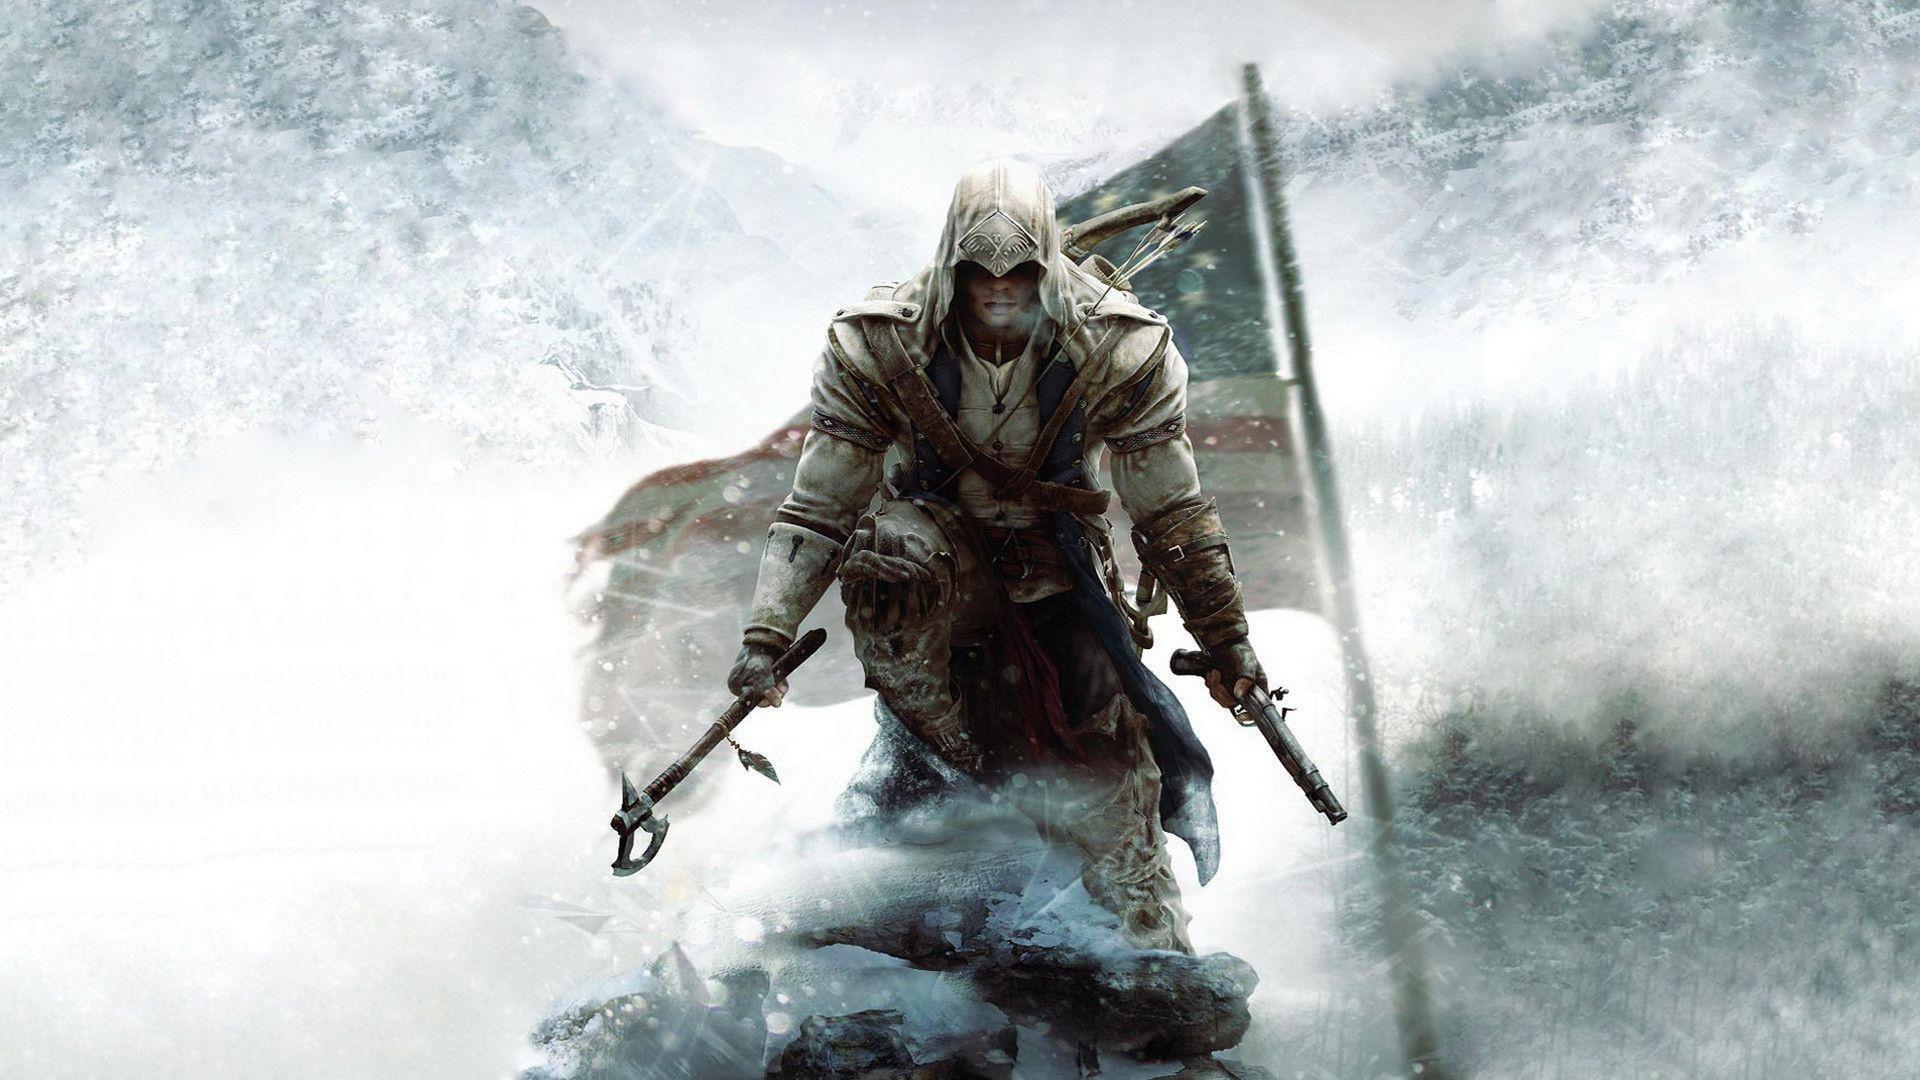 Hd Wallpapers Assassins Creed 3 Hd Desktop 9 HD Wallpapers ...